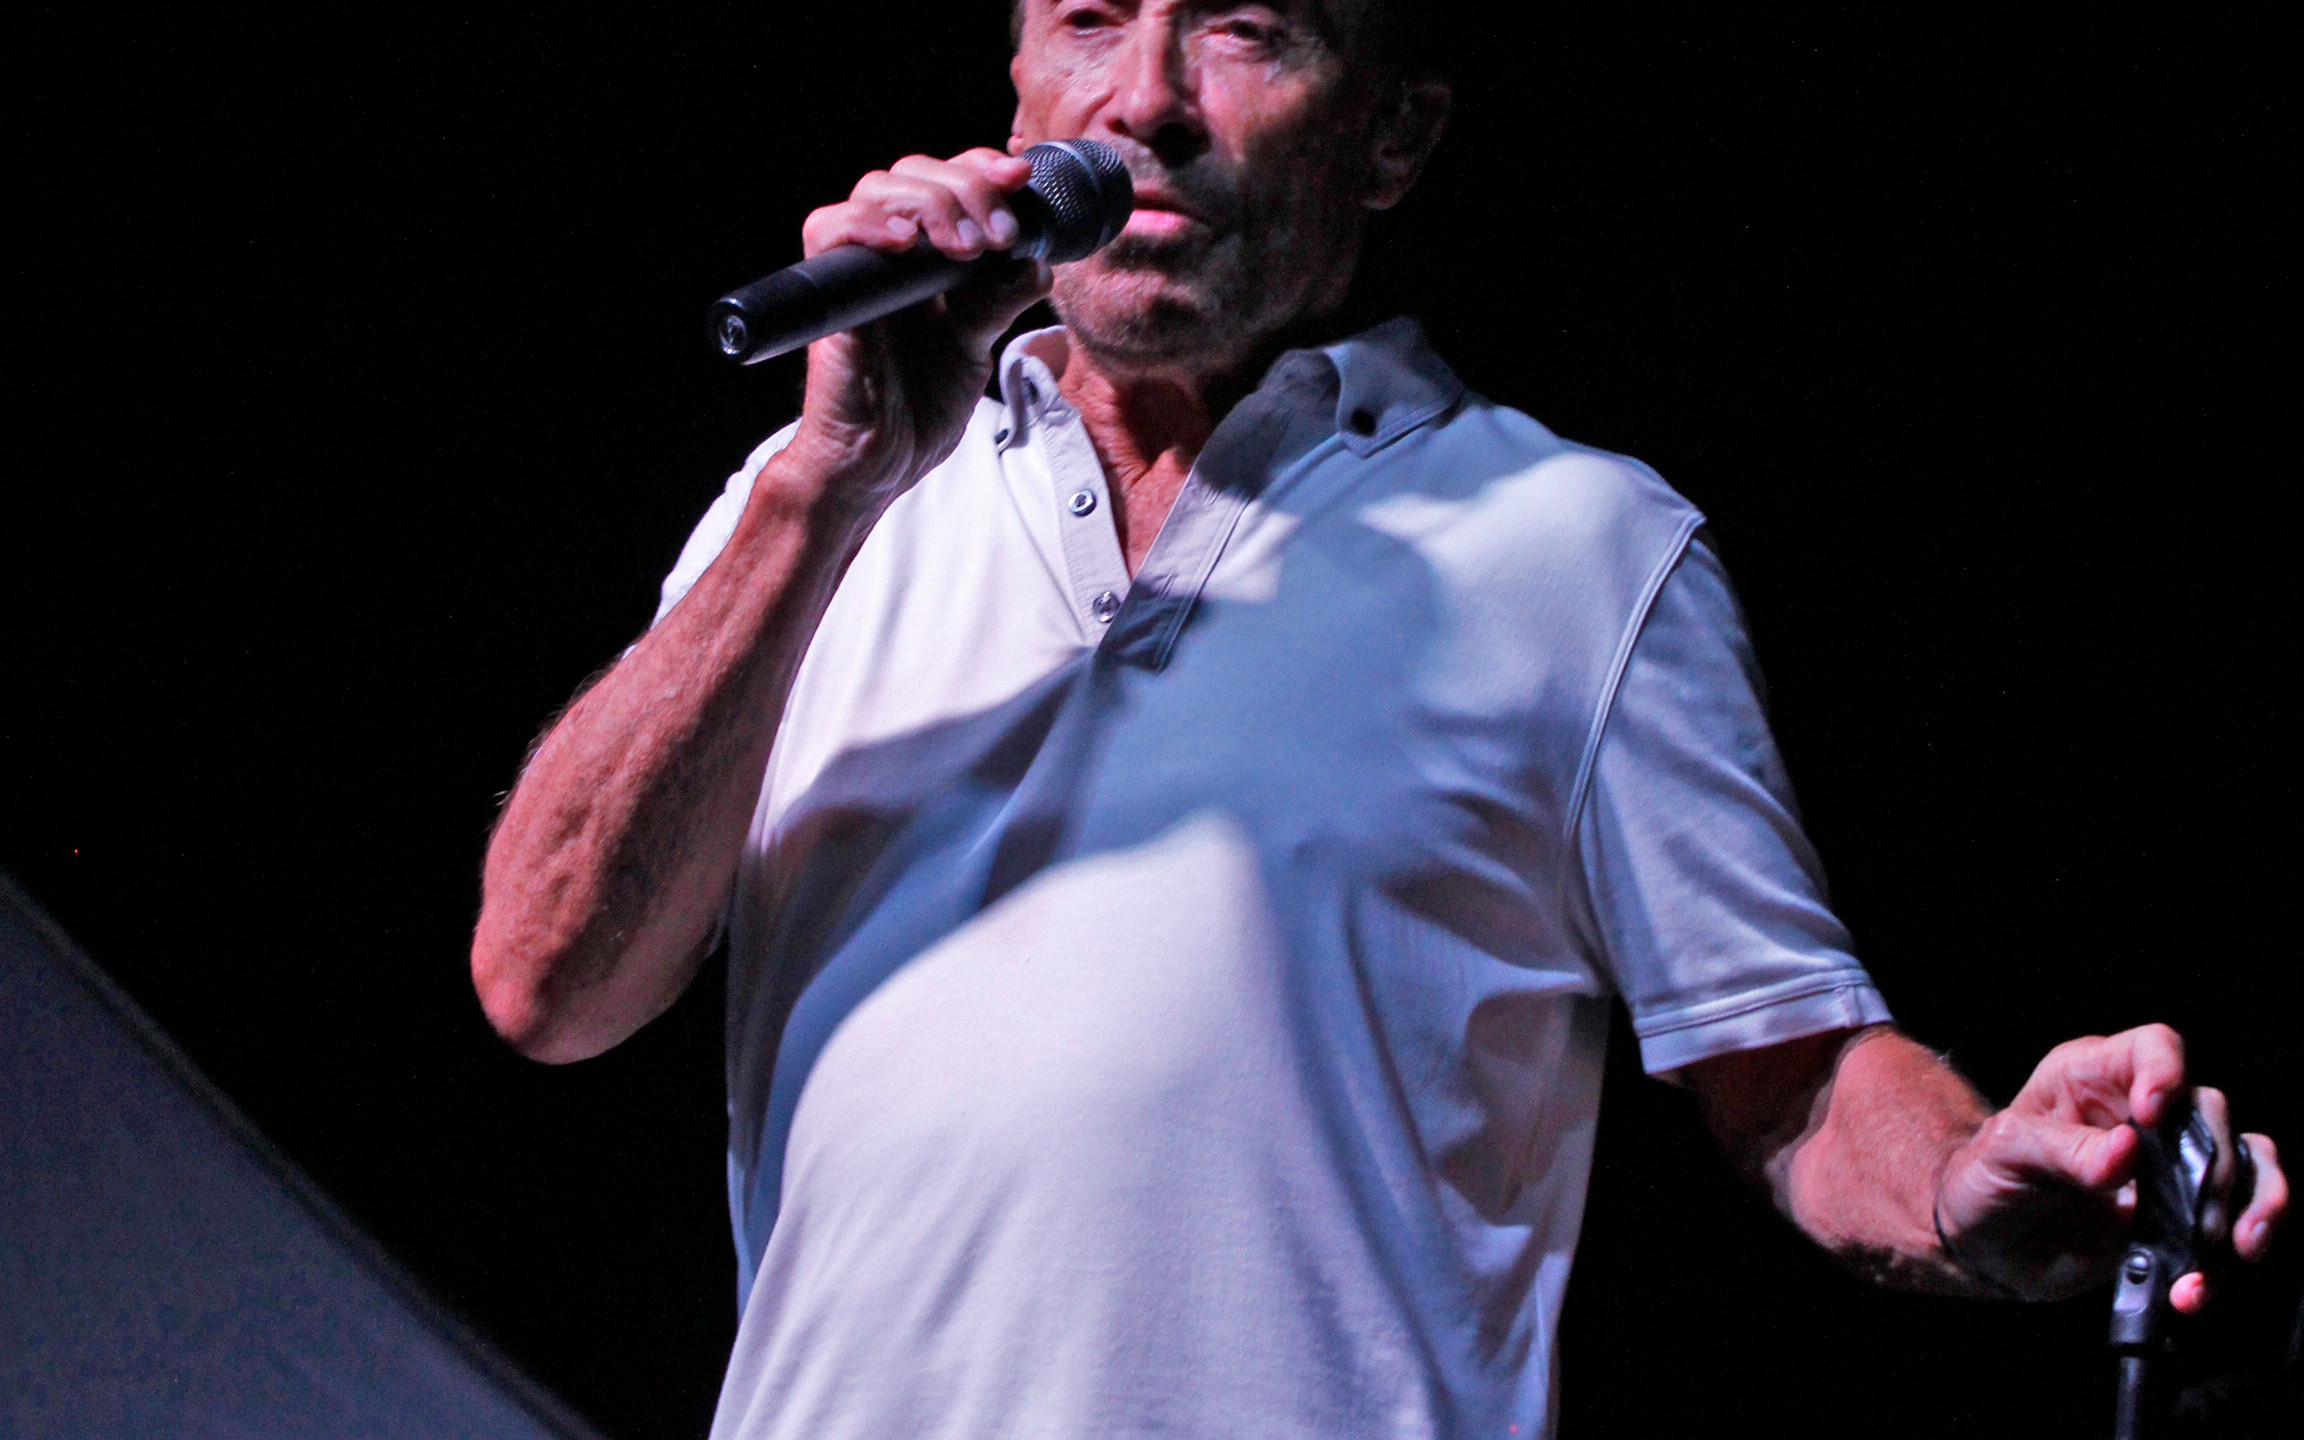 Lee Greenwood performs at Beachaven Wine